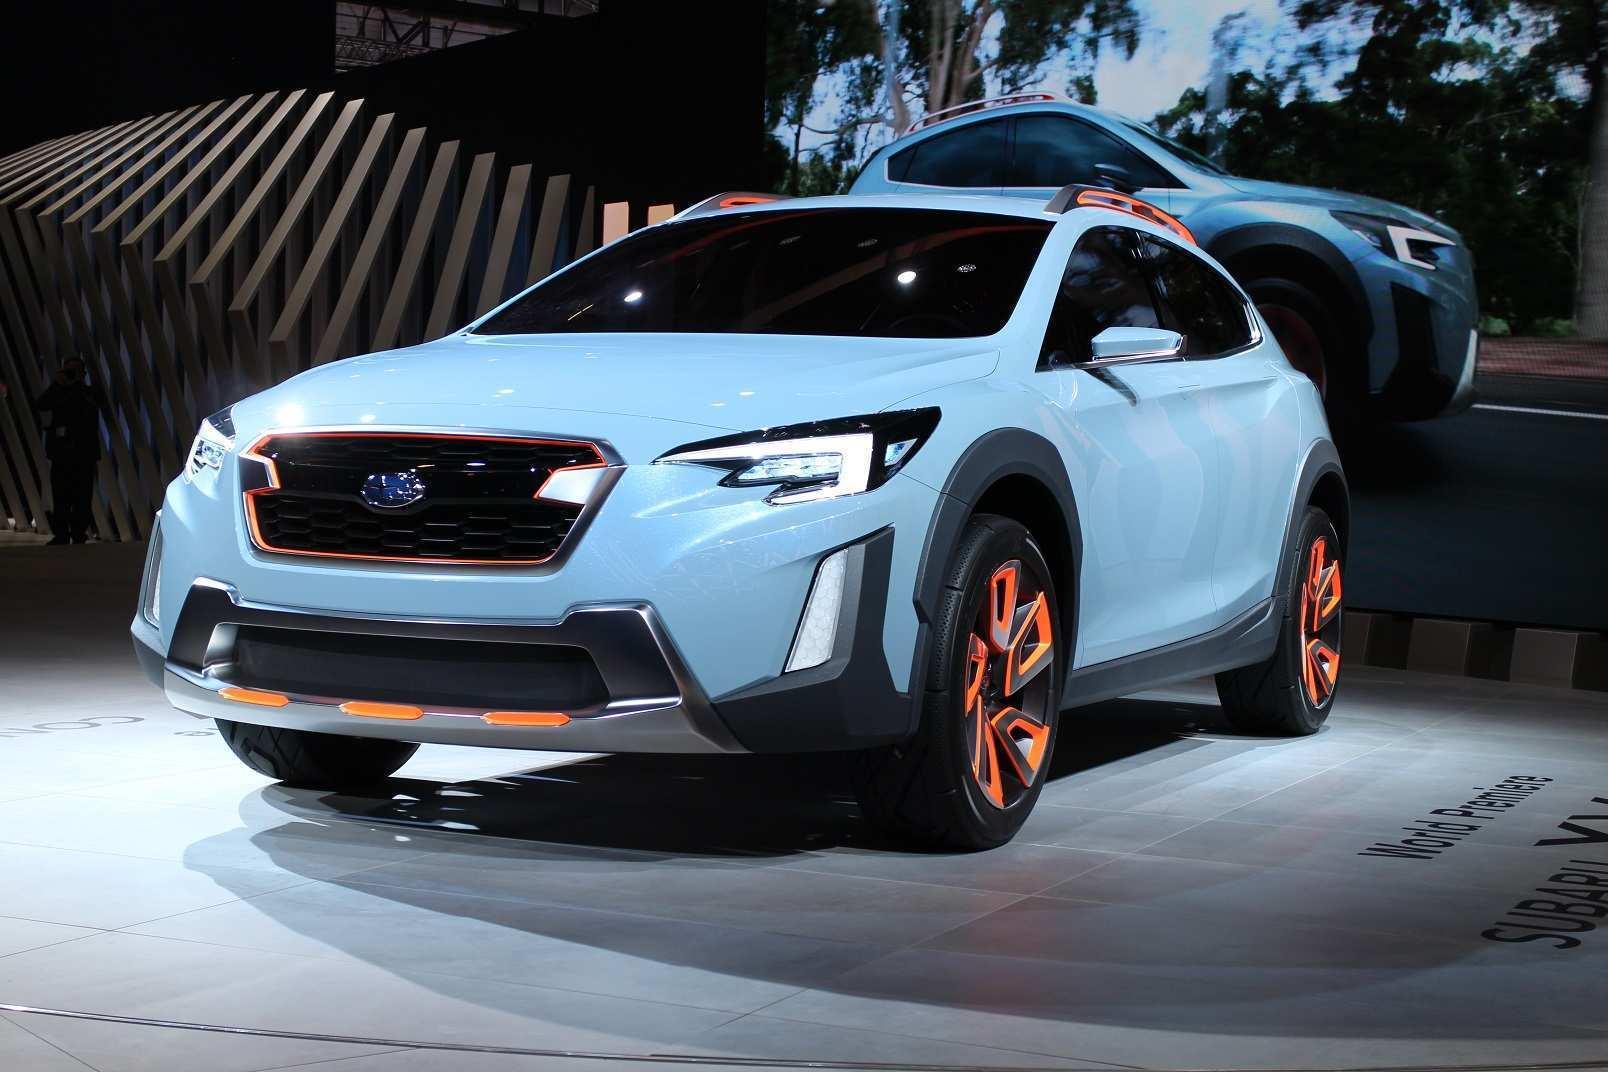 84 Concept of Subaru 2020 Xv Overview with Subaru 2020 Xv